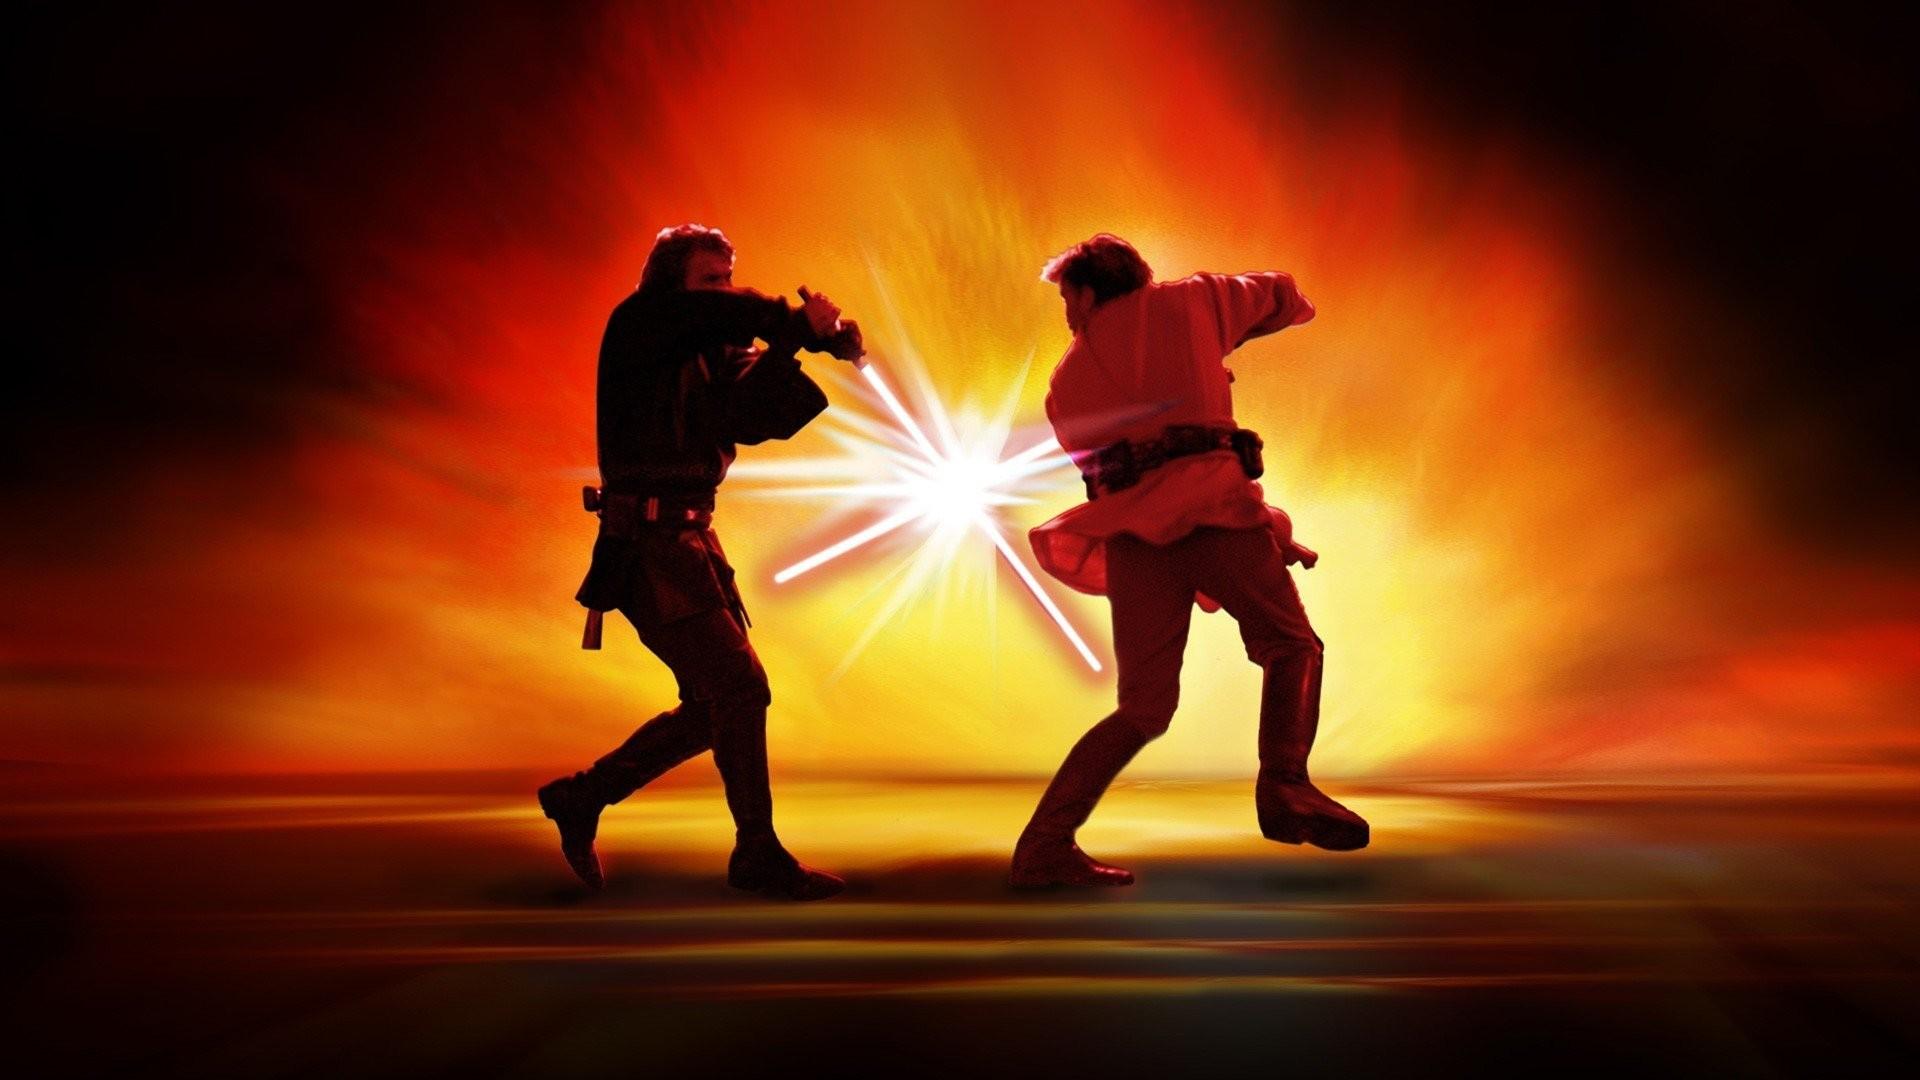 Movies Star Wars Anakin Skywalker Obi-Wan Kenobi …